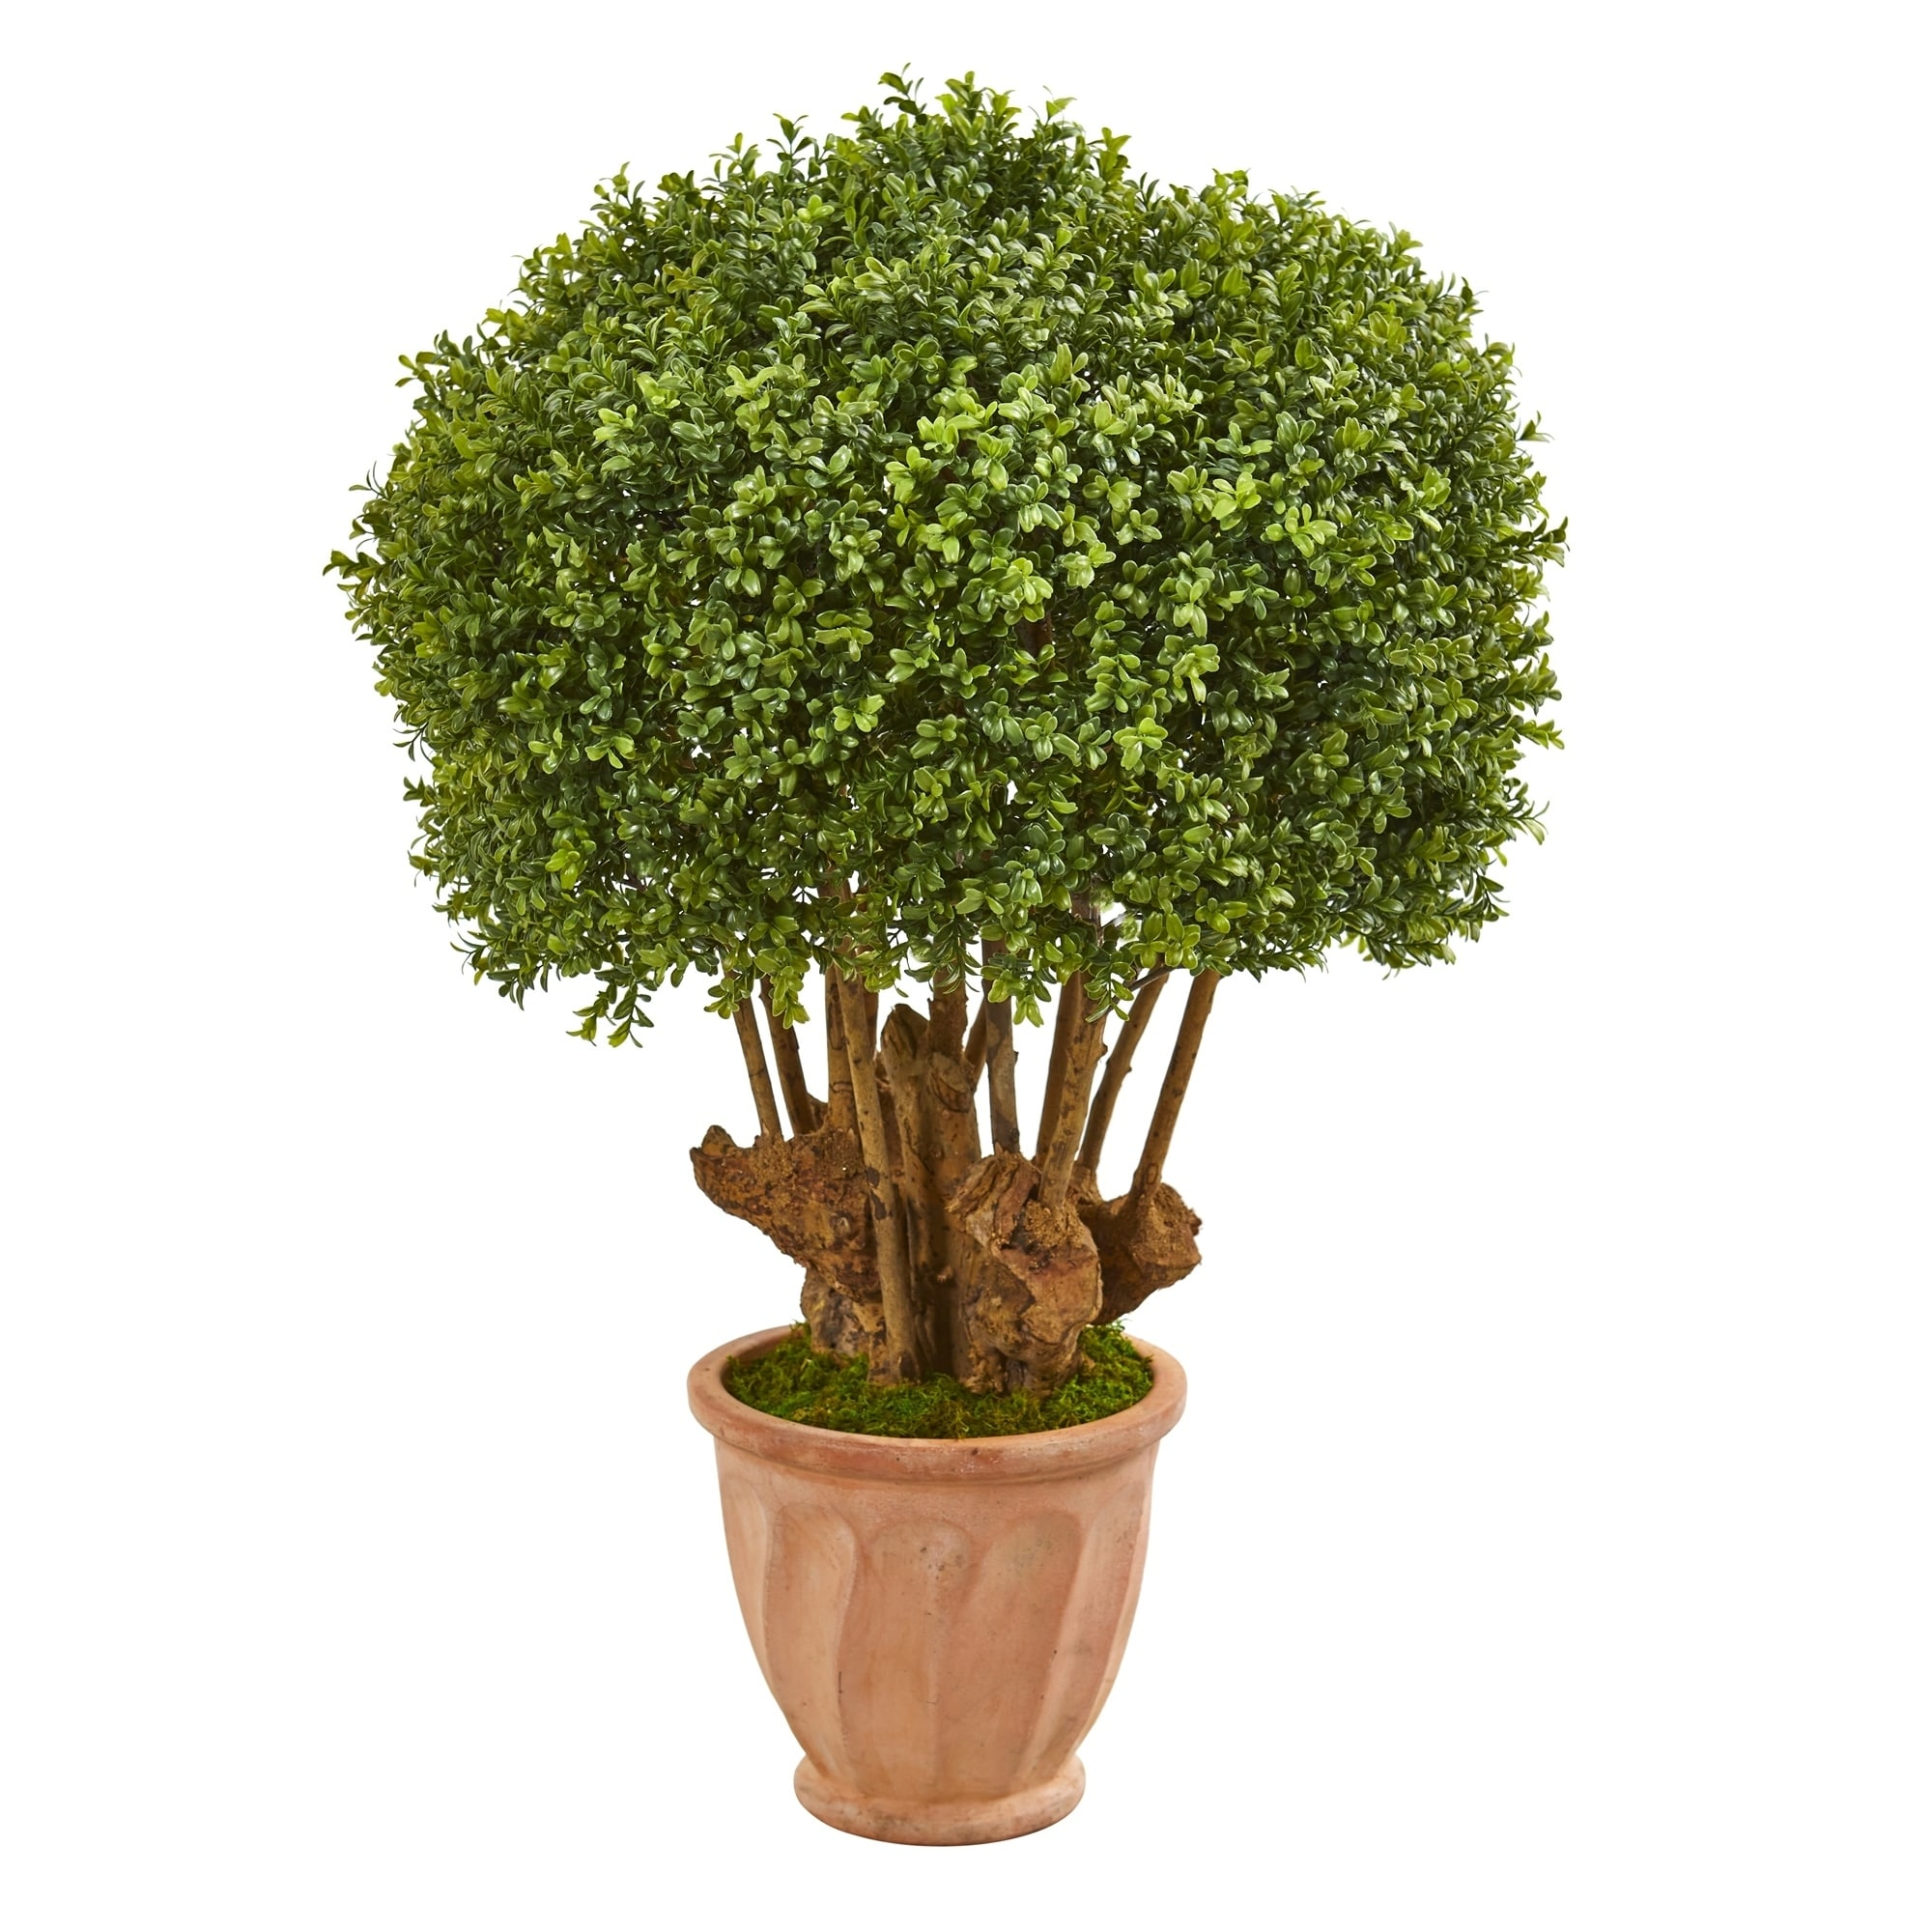 39 Boxwood Artificial Topiary Tree in Terracotta Planter (Indoor/Outdoor)